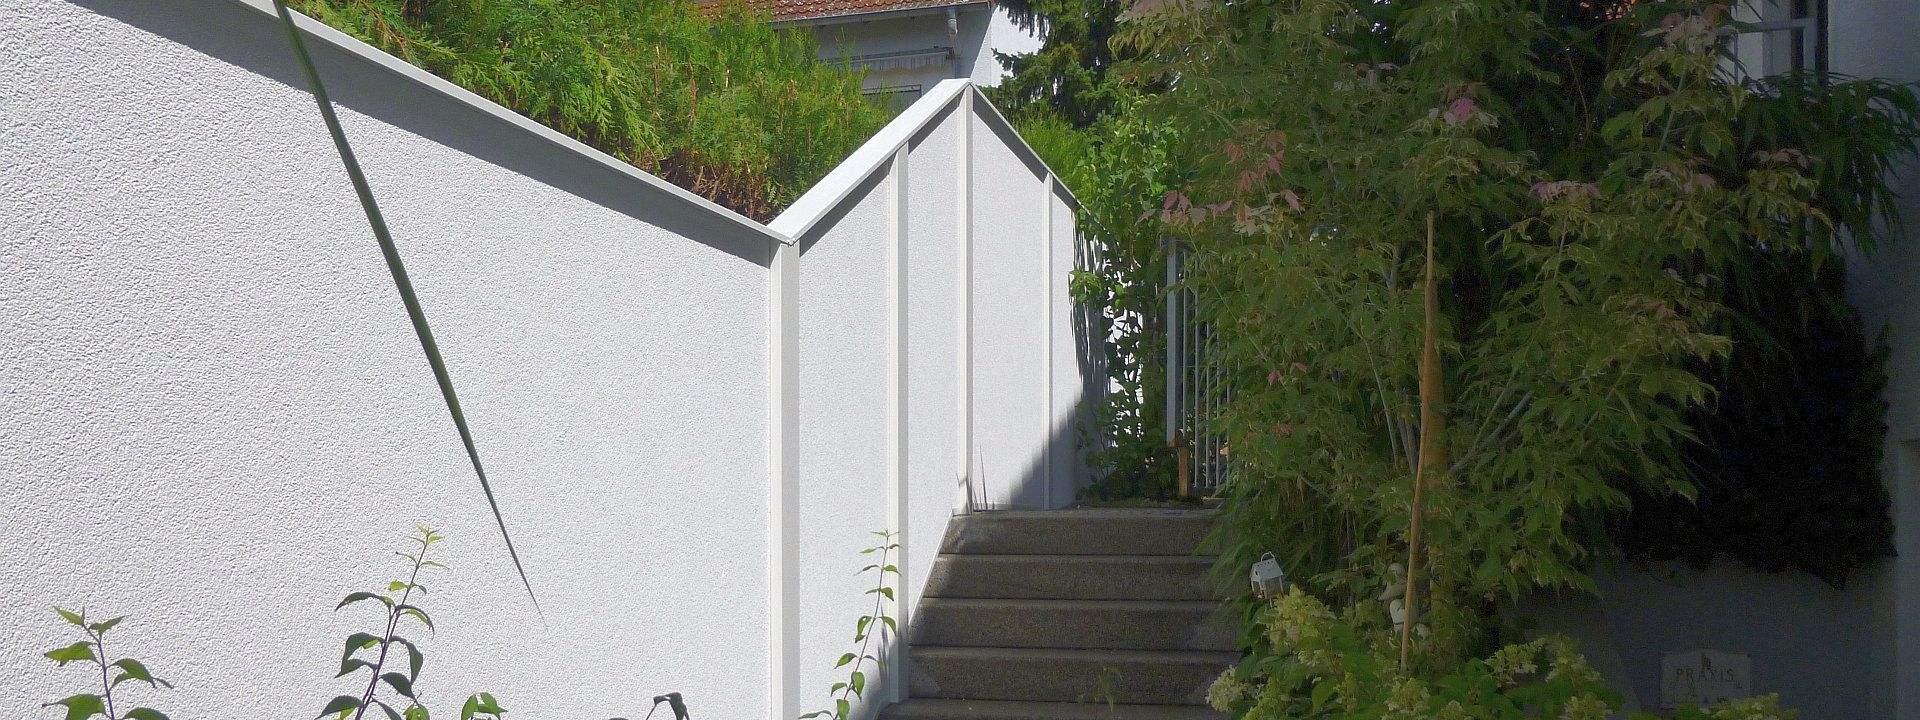 Modulare Wandsysteme Variante II